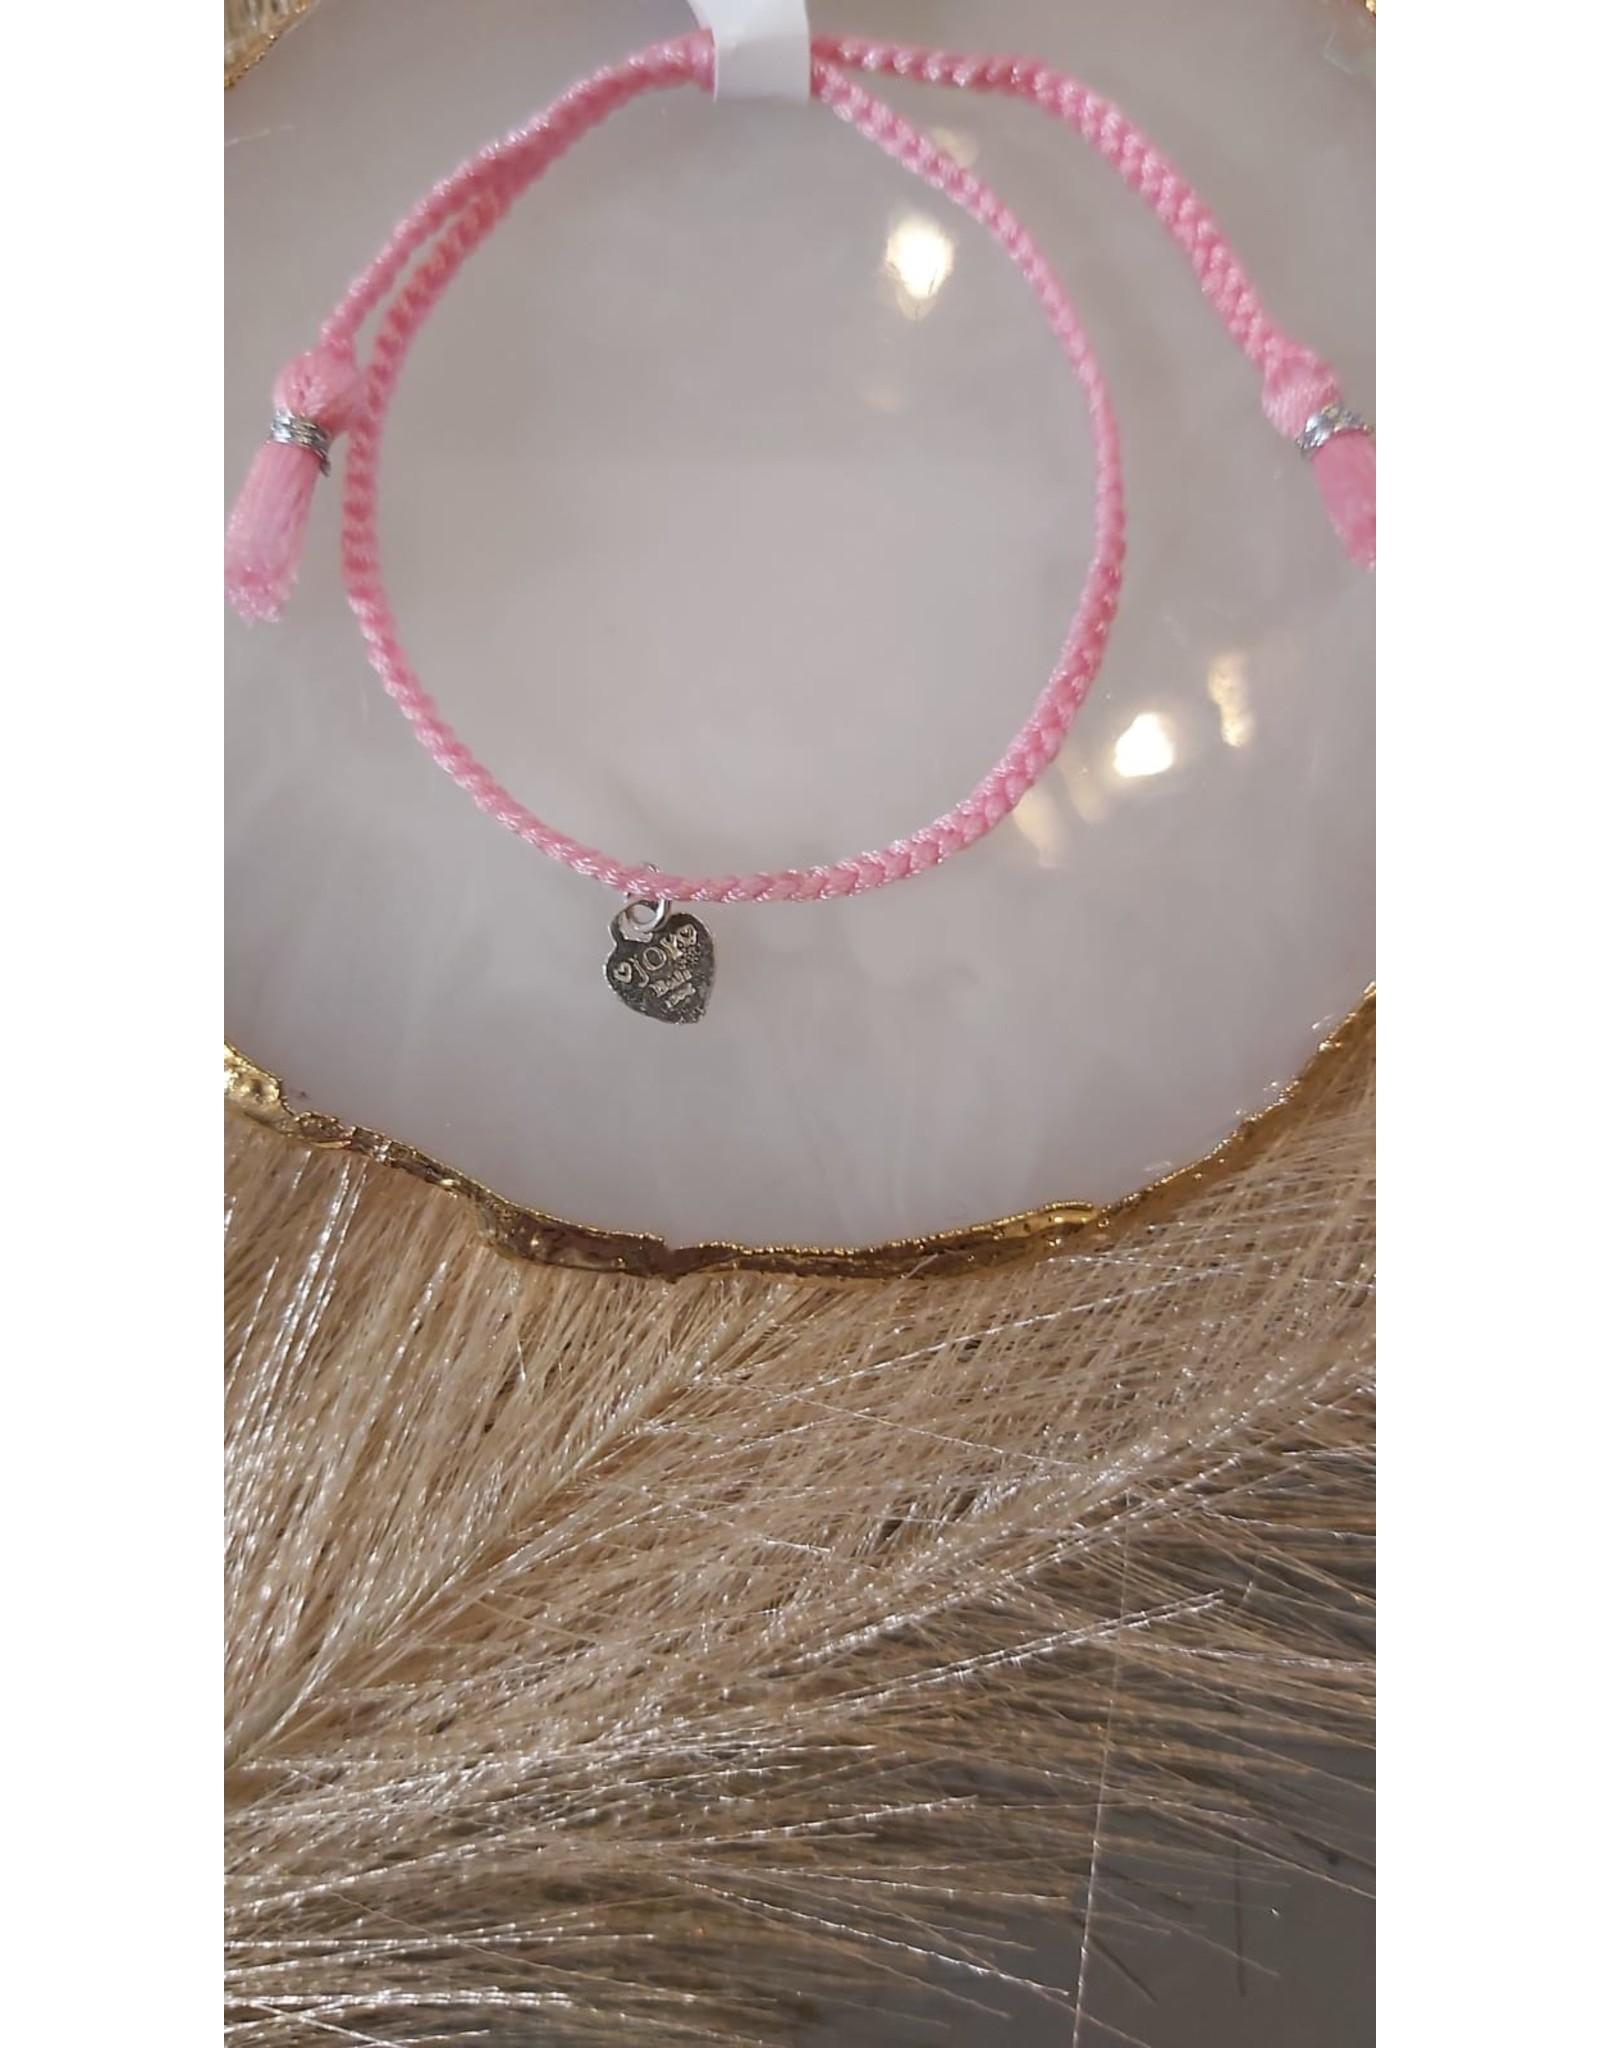 Joy Bali JOY Bali Iluh armband - oud roze